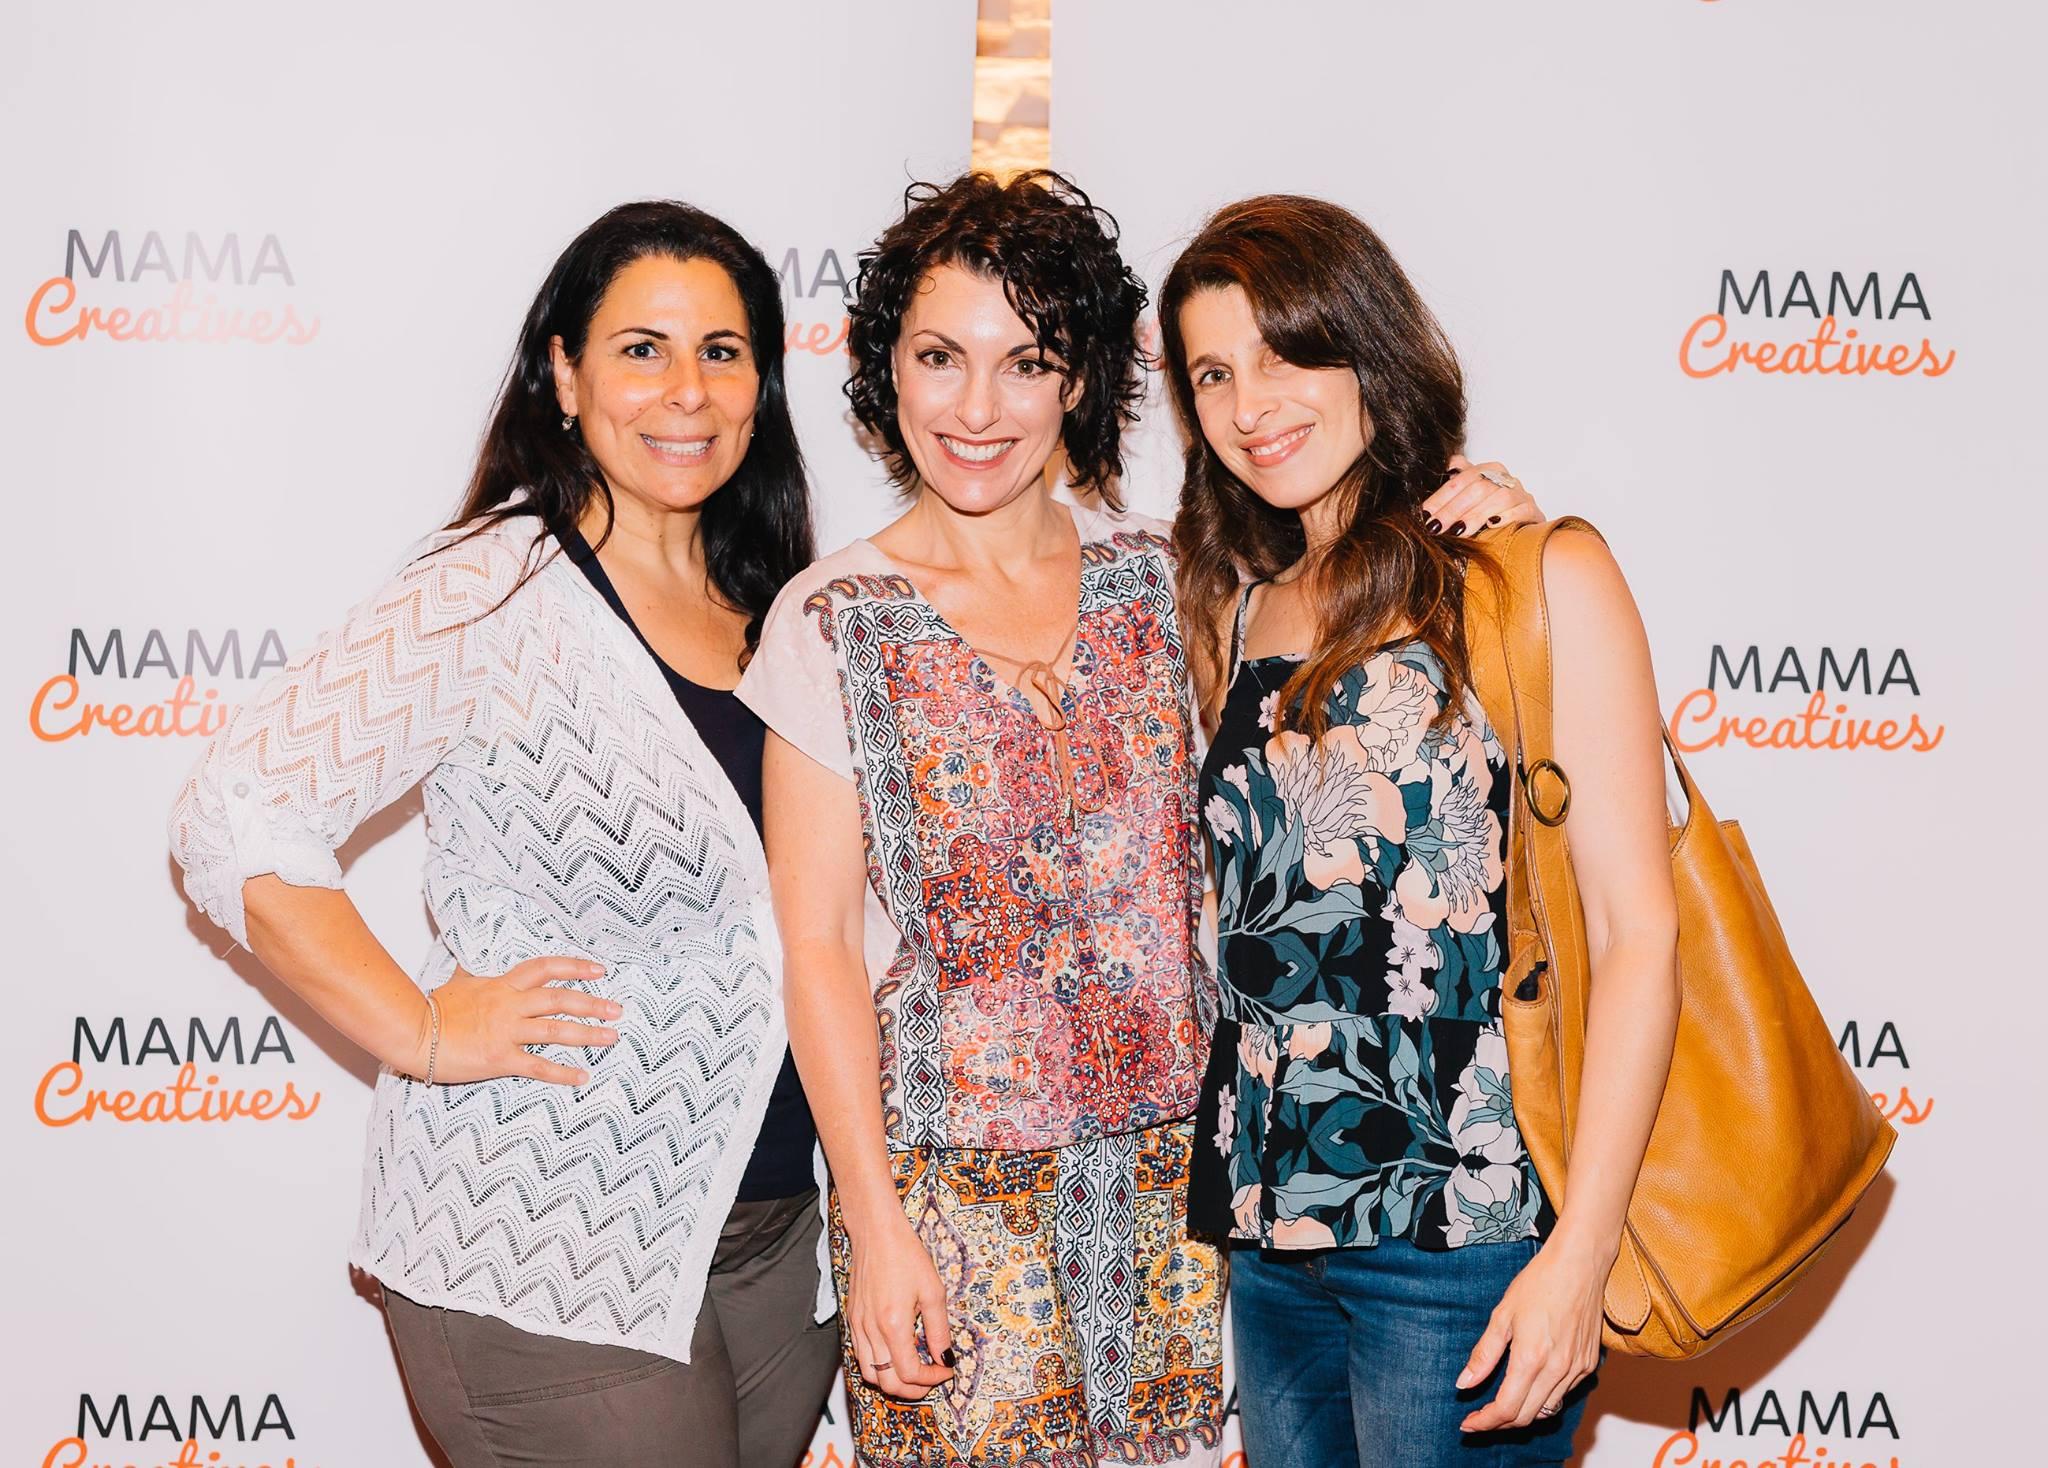 With two fabulous creative mamas — Esther Labi, Kerri Sackville and Nadine Ben-Mayor.